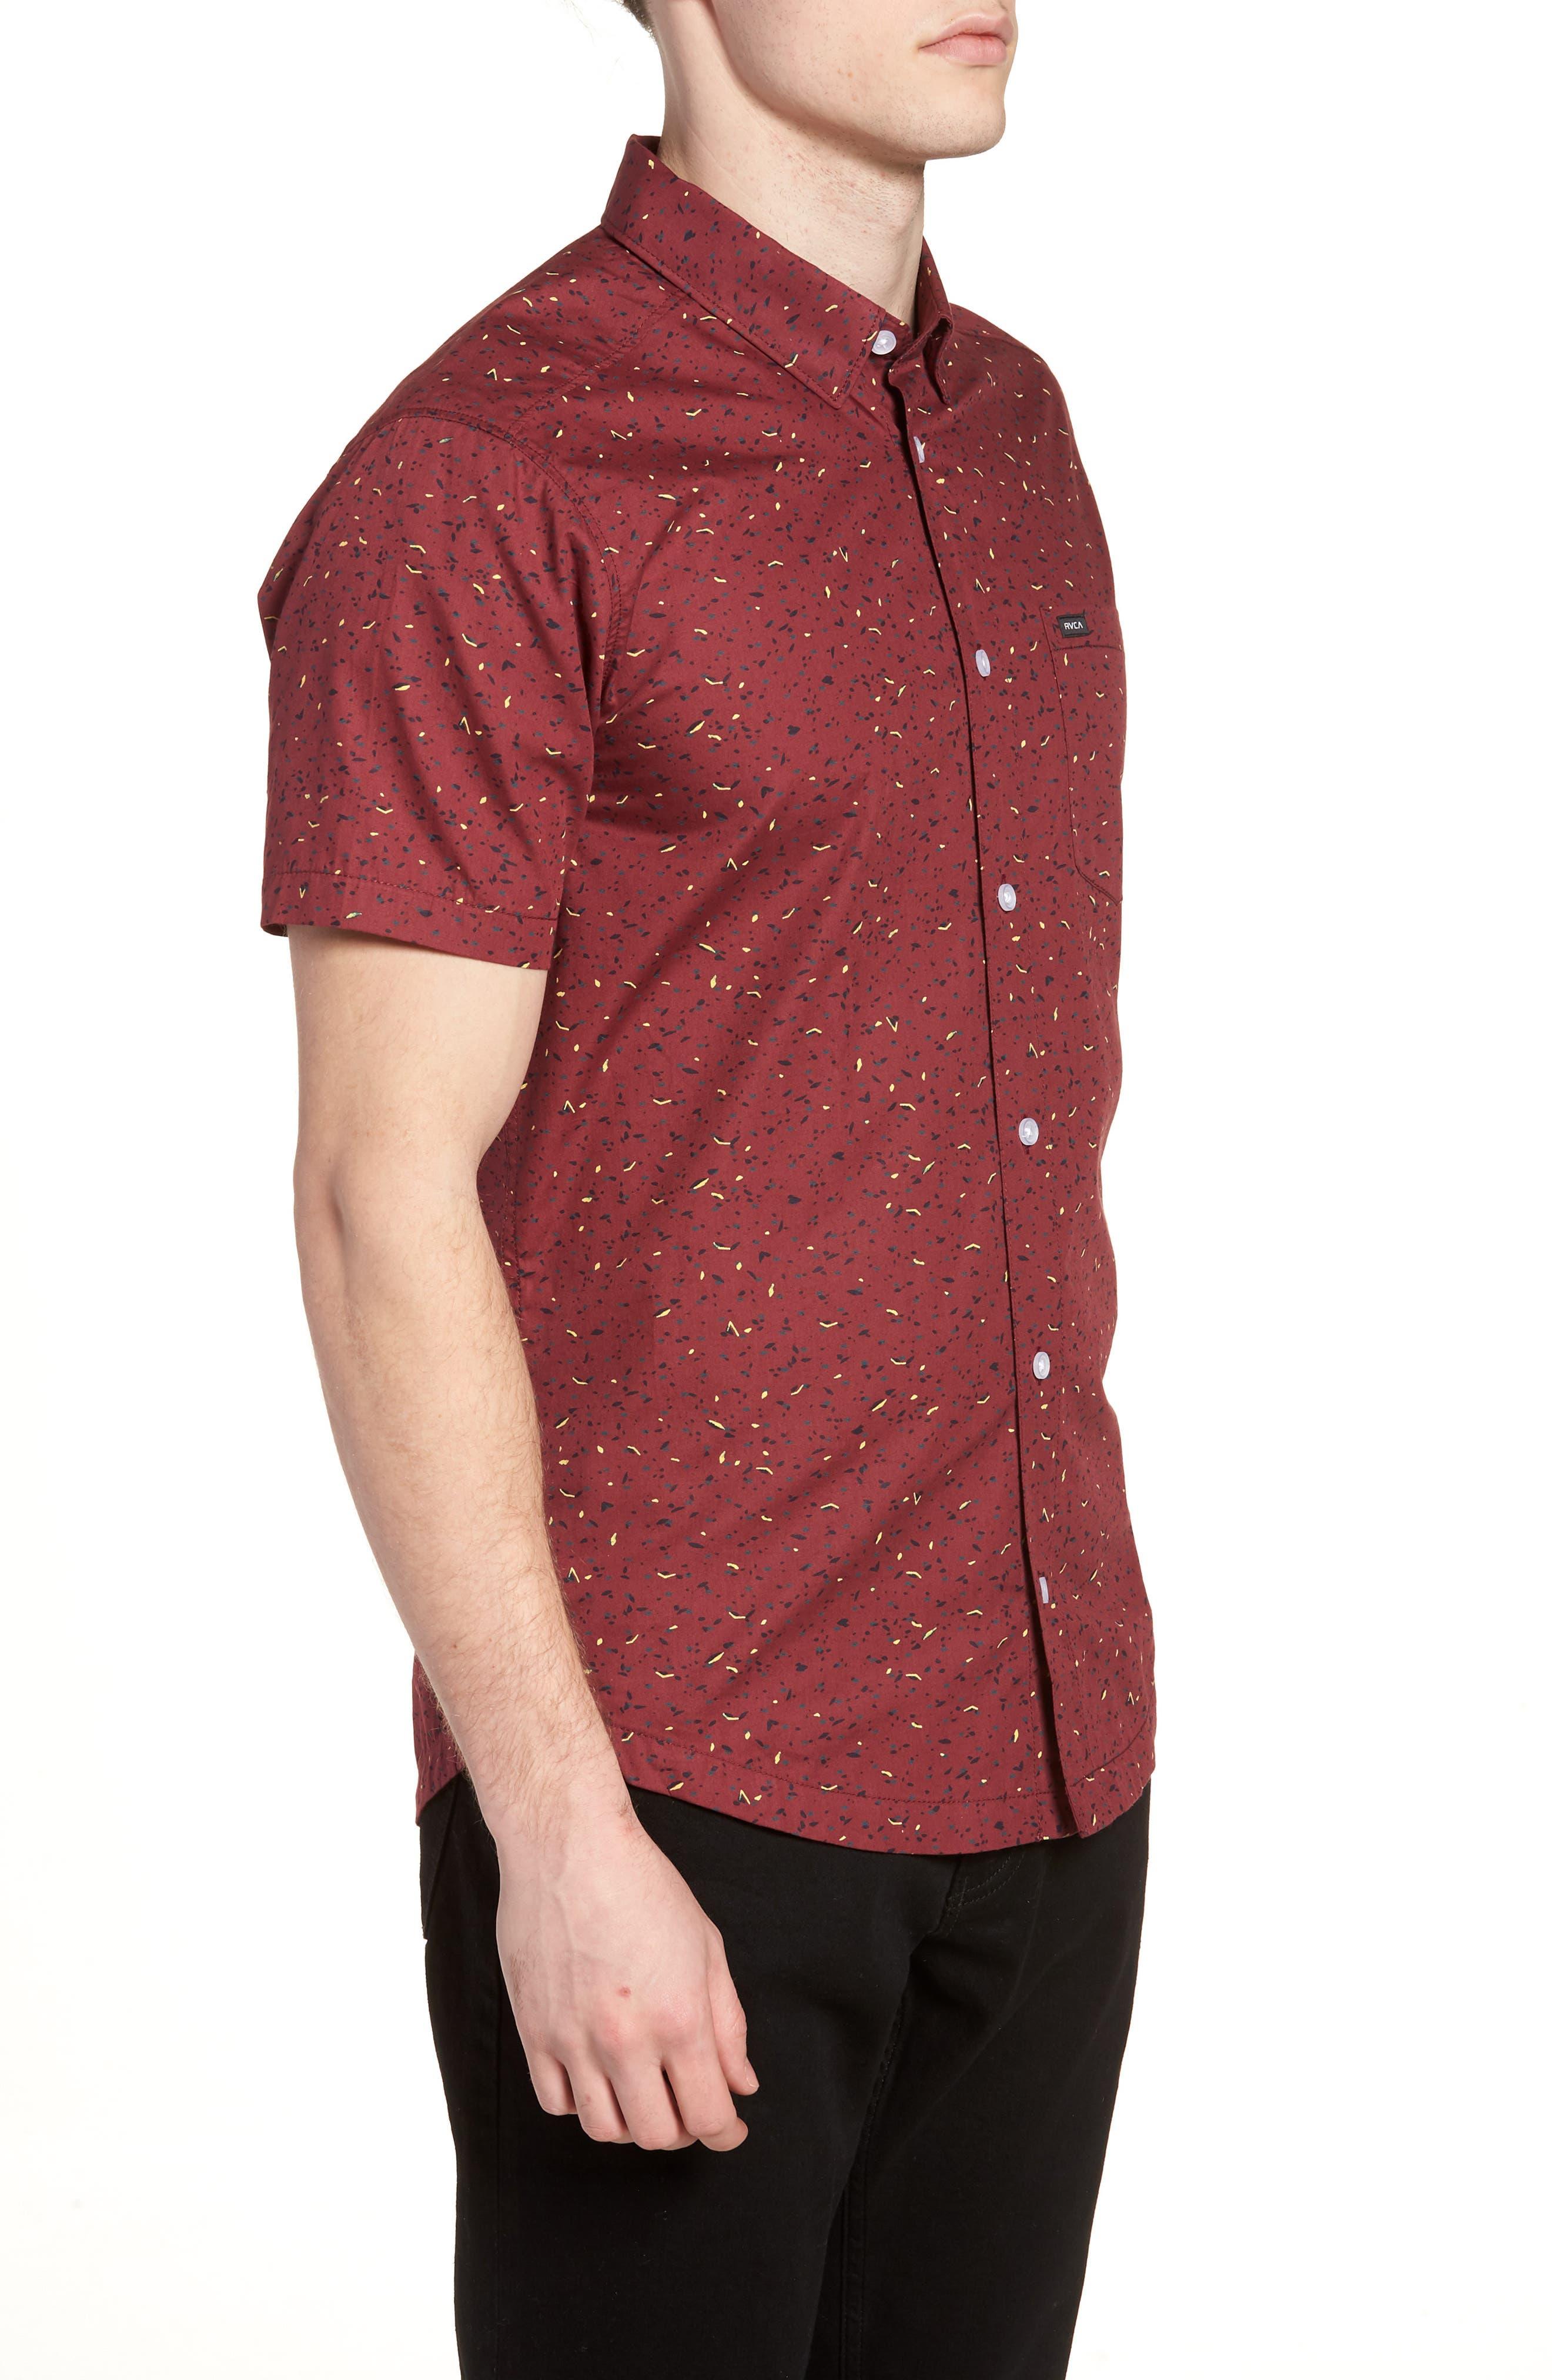 Jaded Woven Shirt,                             Alternate thumbnail 4, color,                             Tawny Port